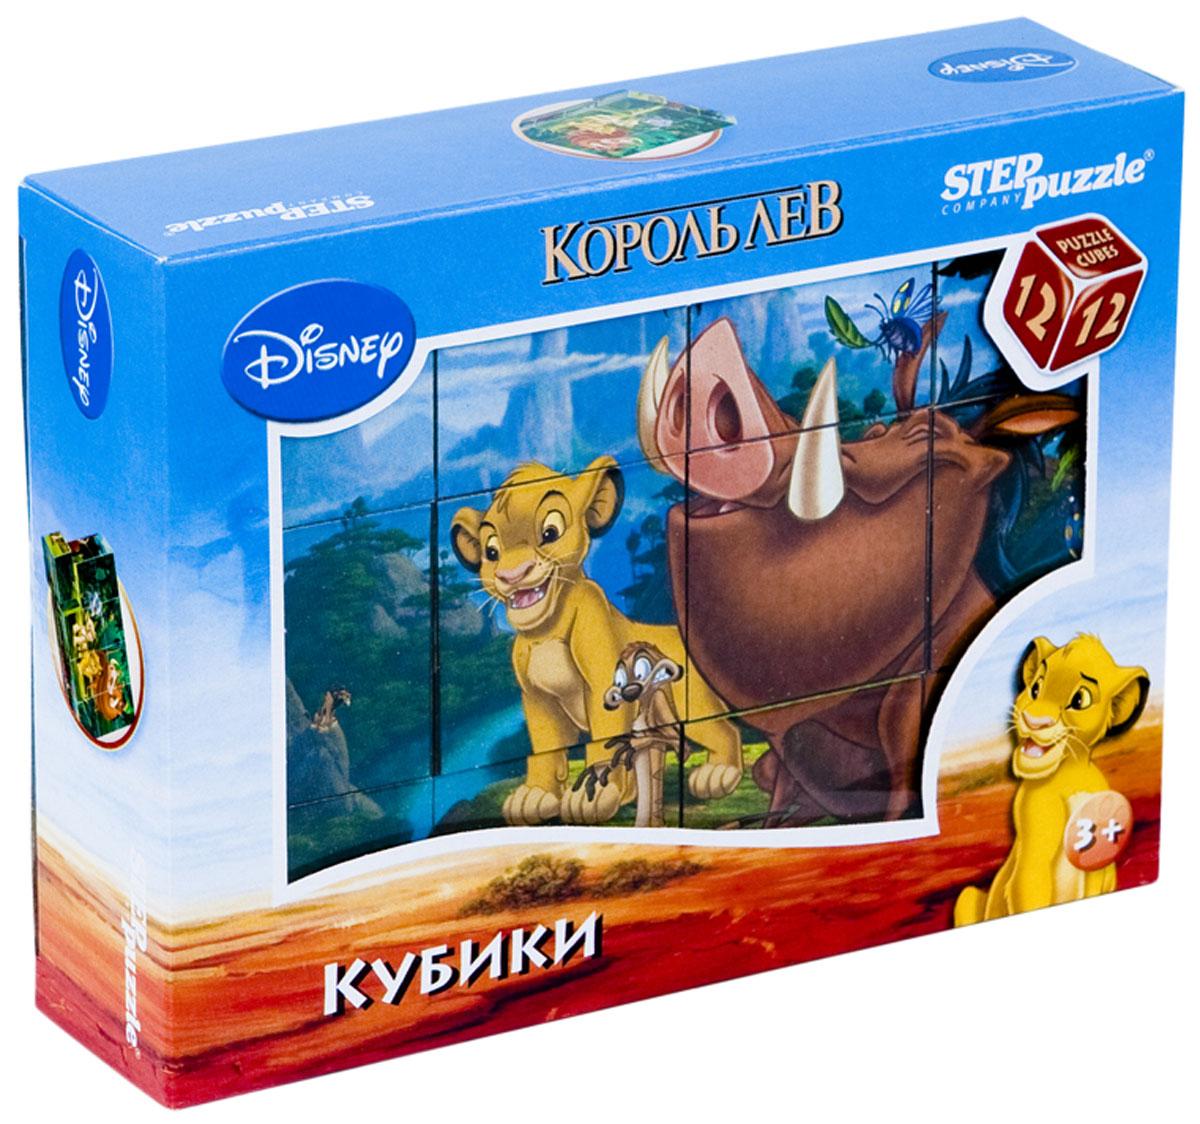 Step Puzzle Кубики Король Лев